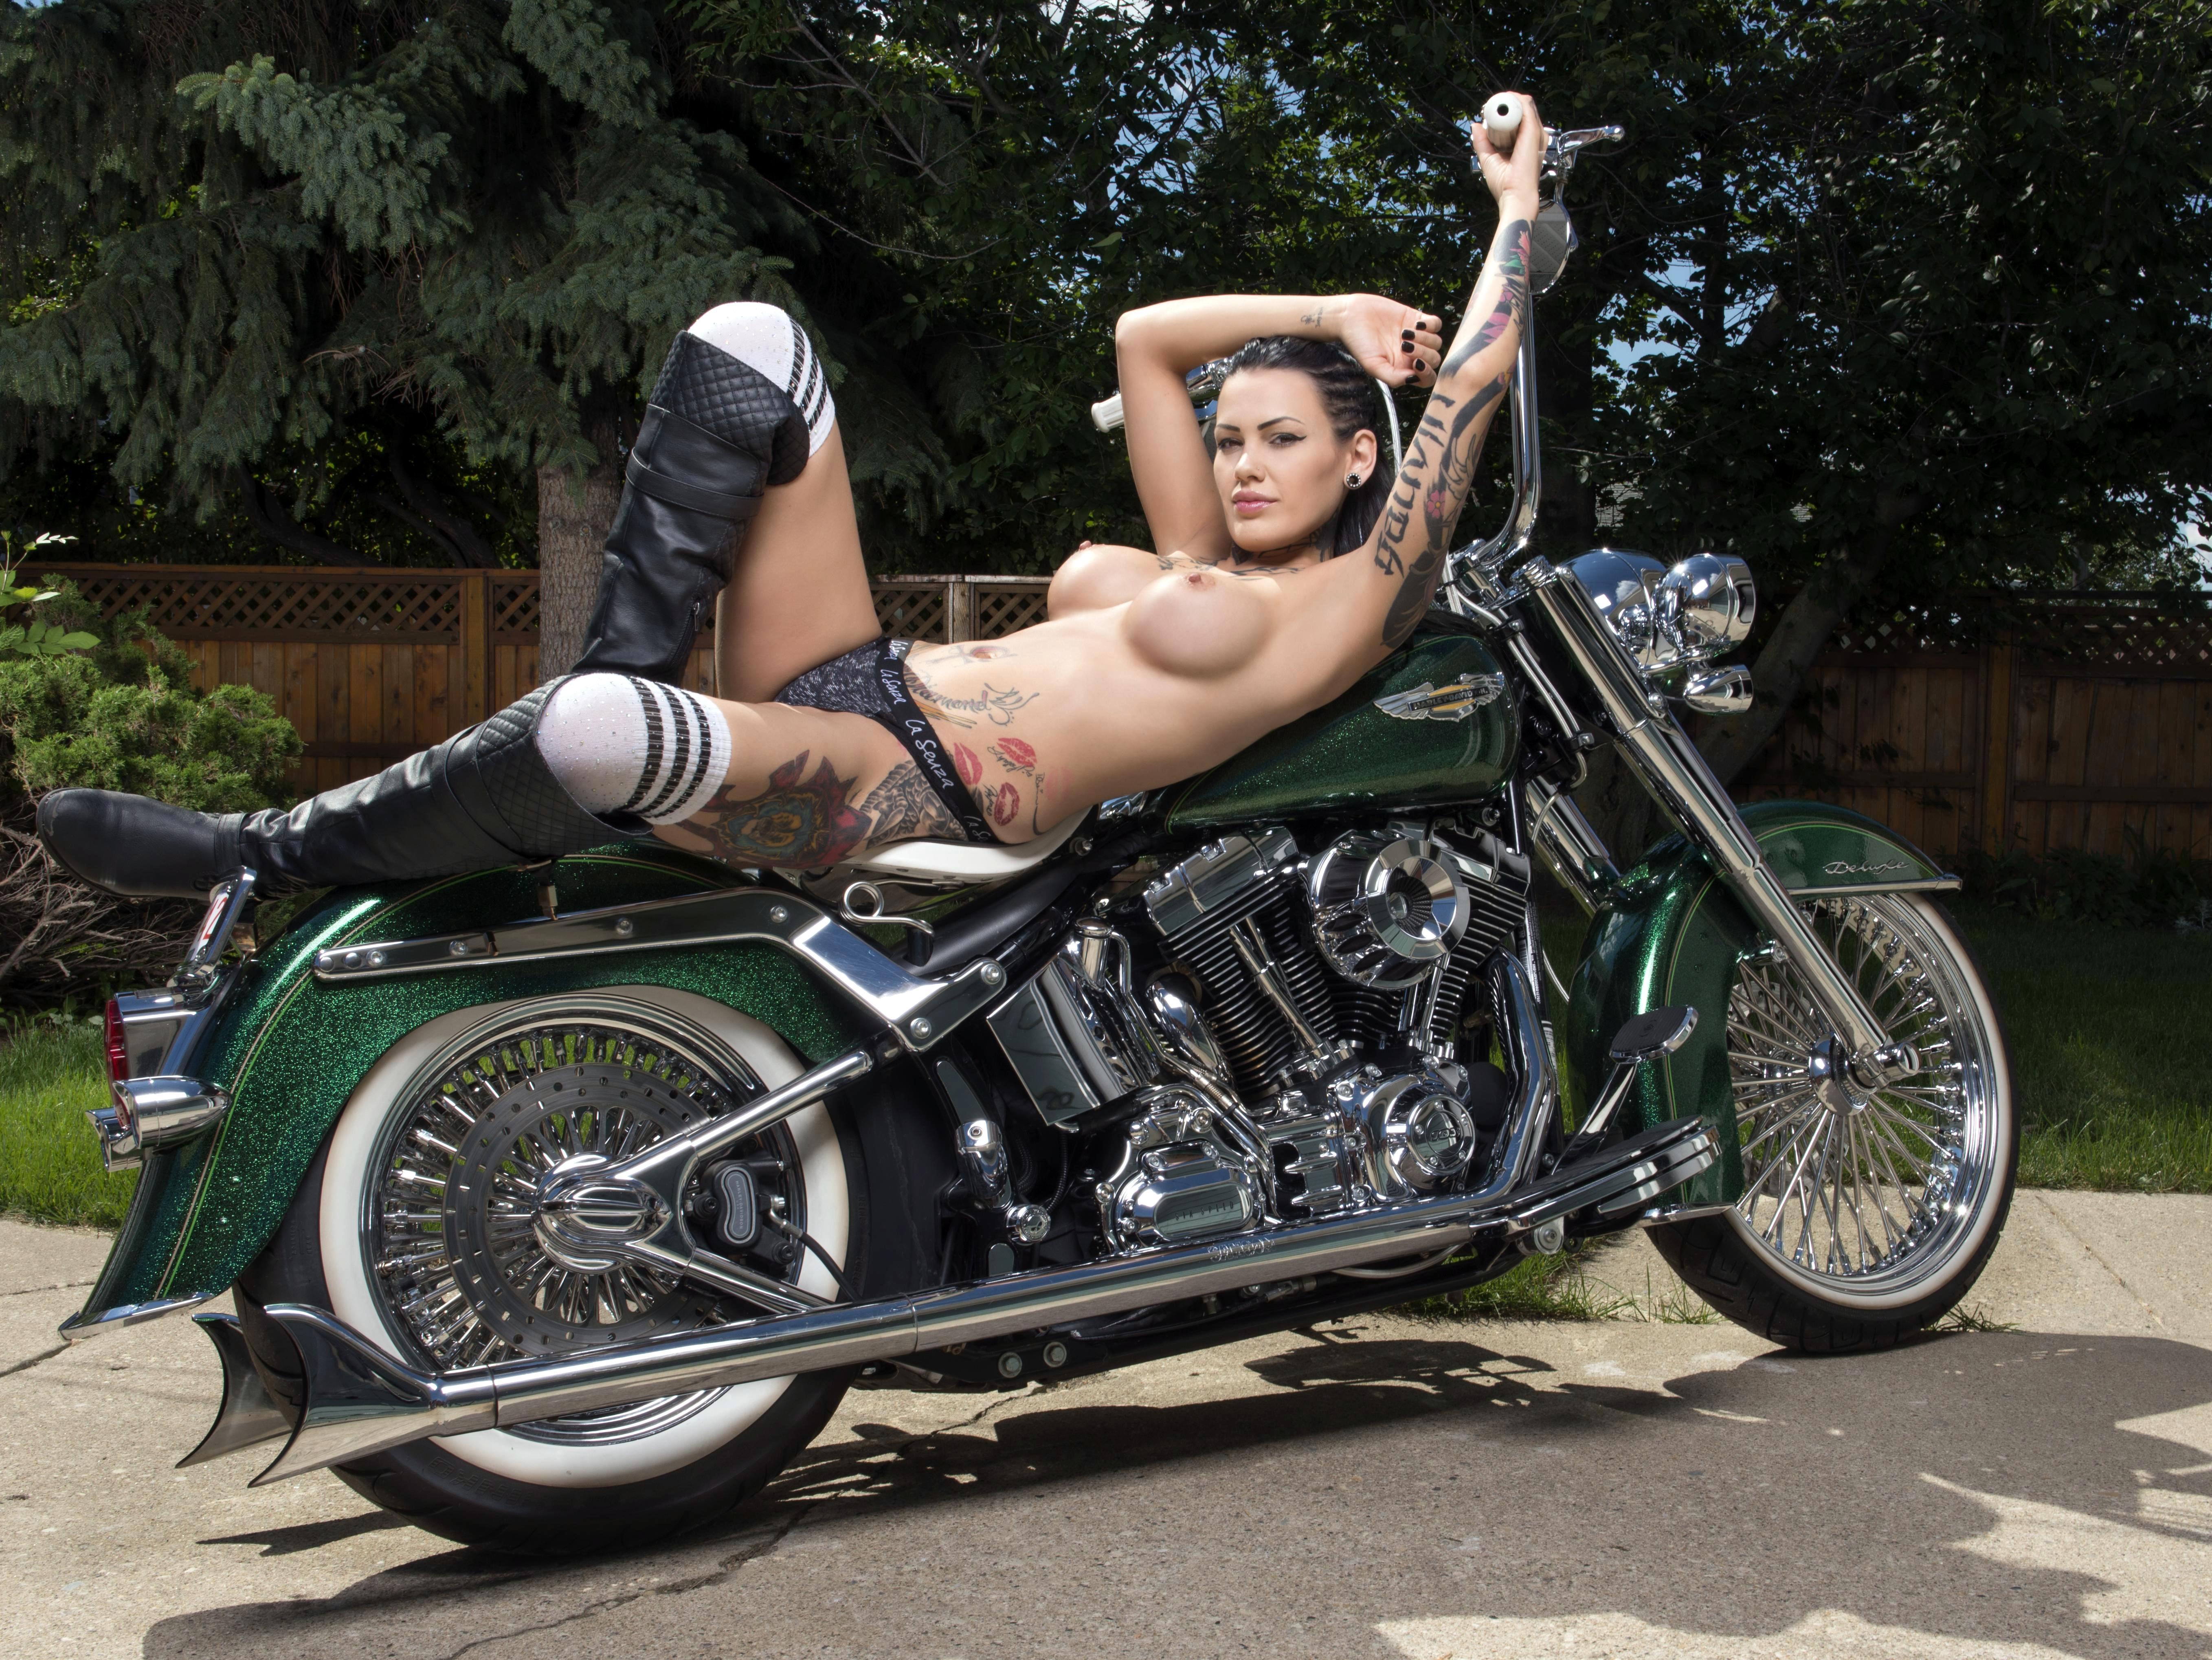 Nude Hot Biker Babes